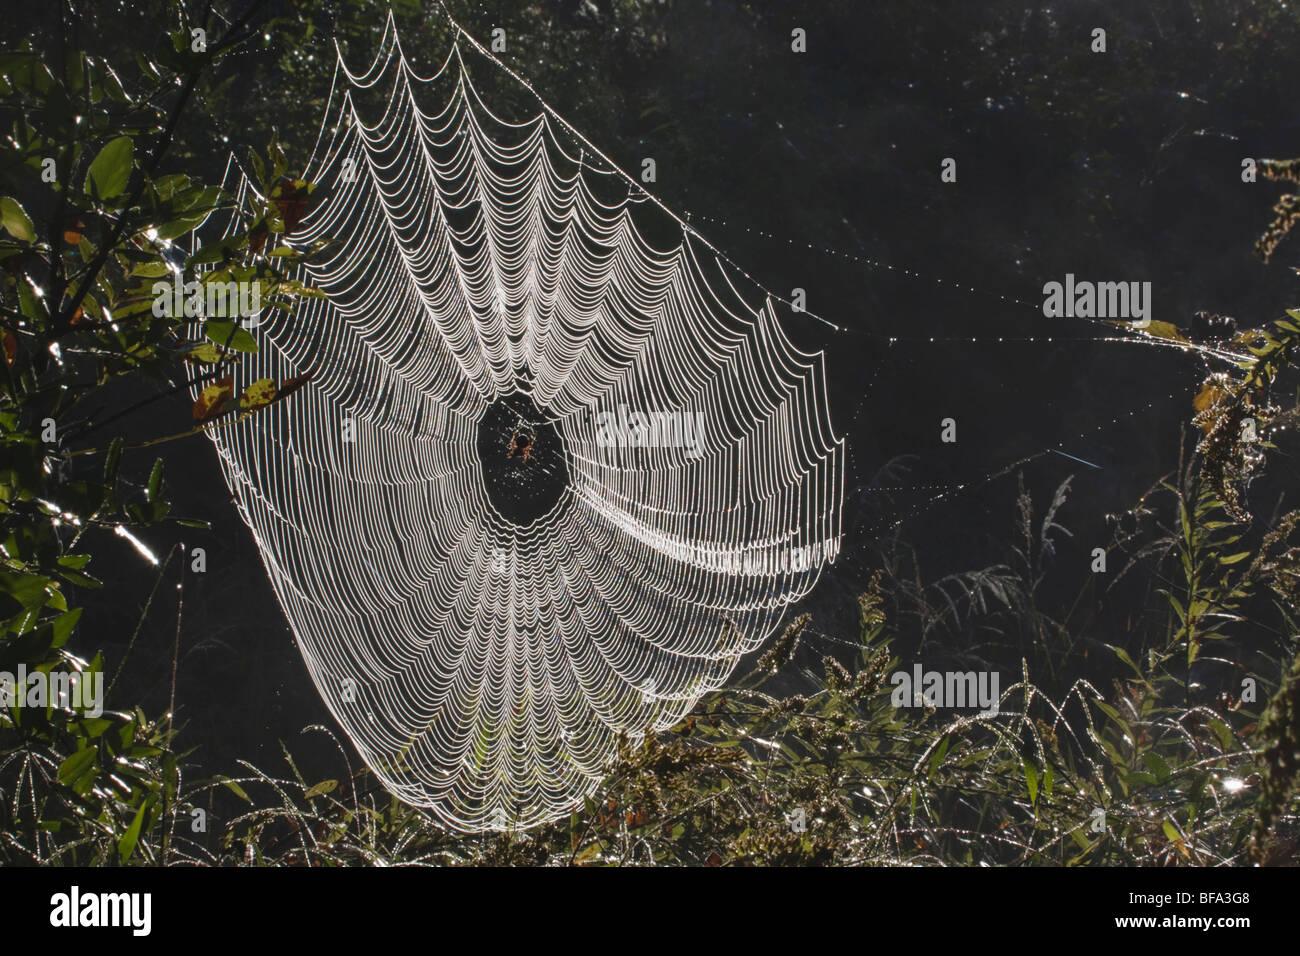 Spider web covered in dew, Lillington, North Carolina, USA - Stock Image